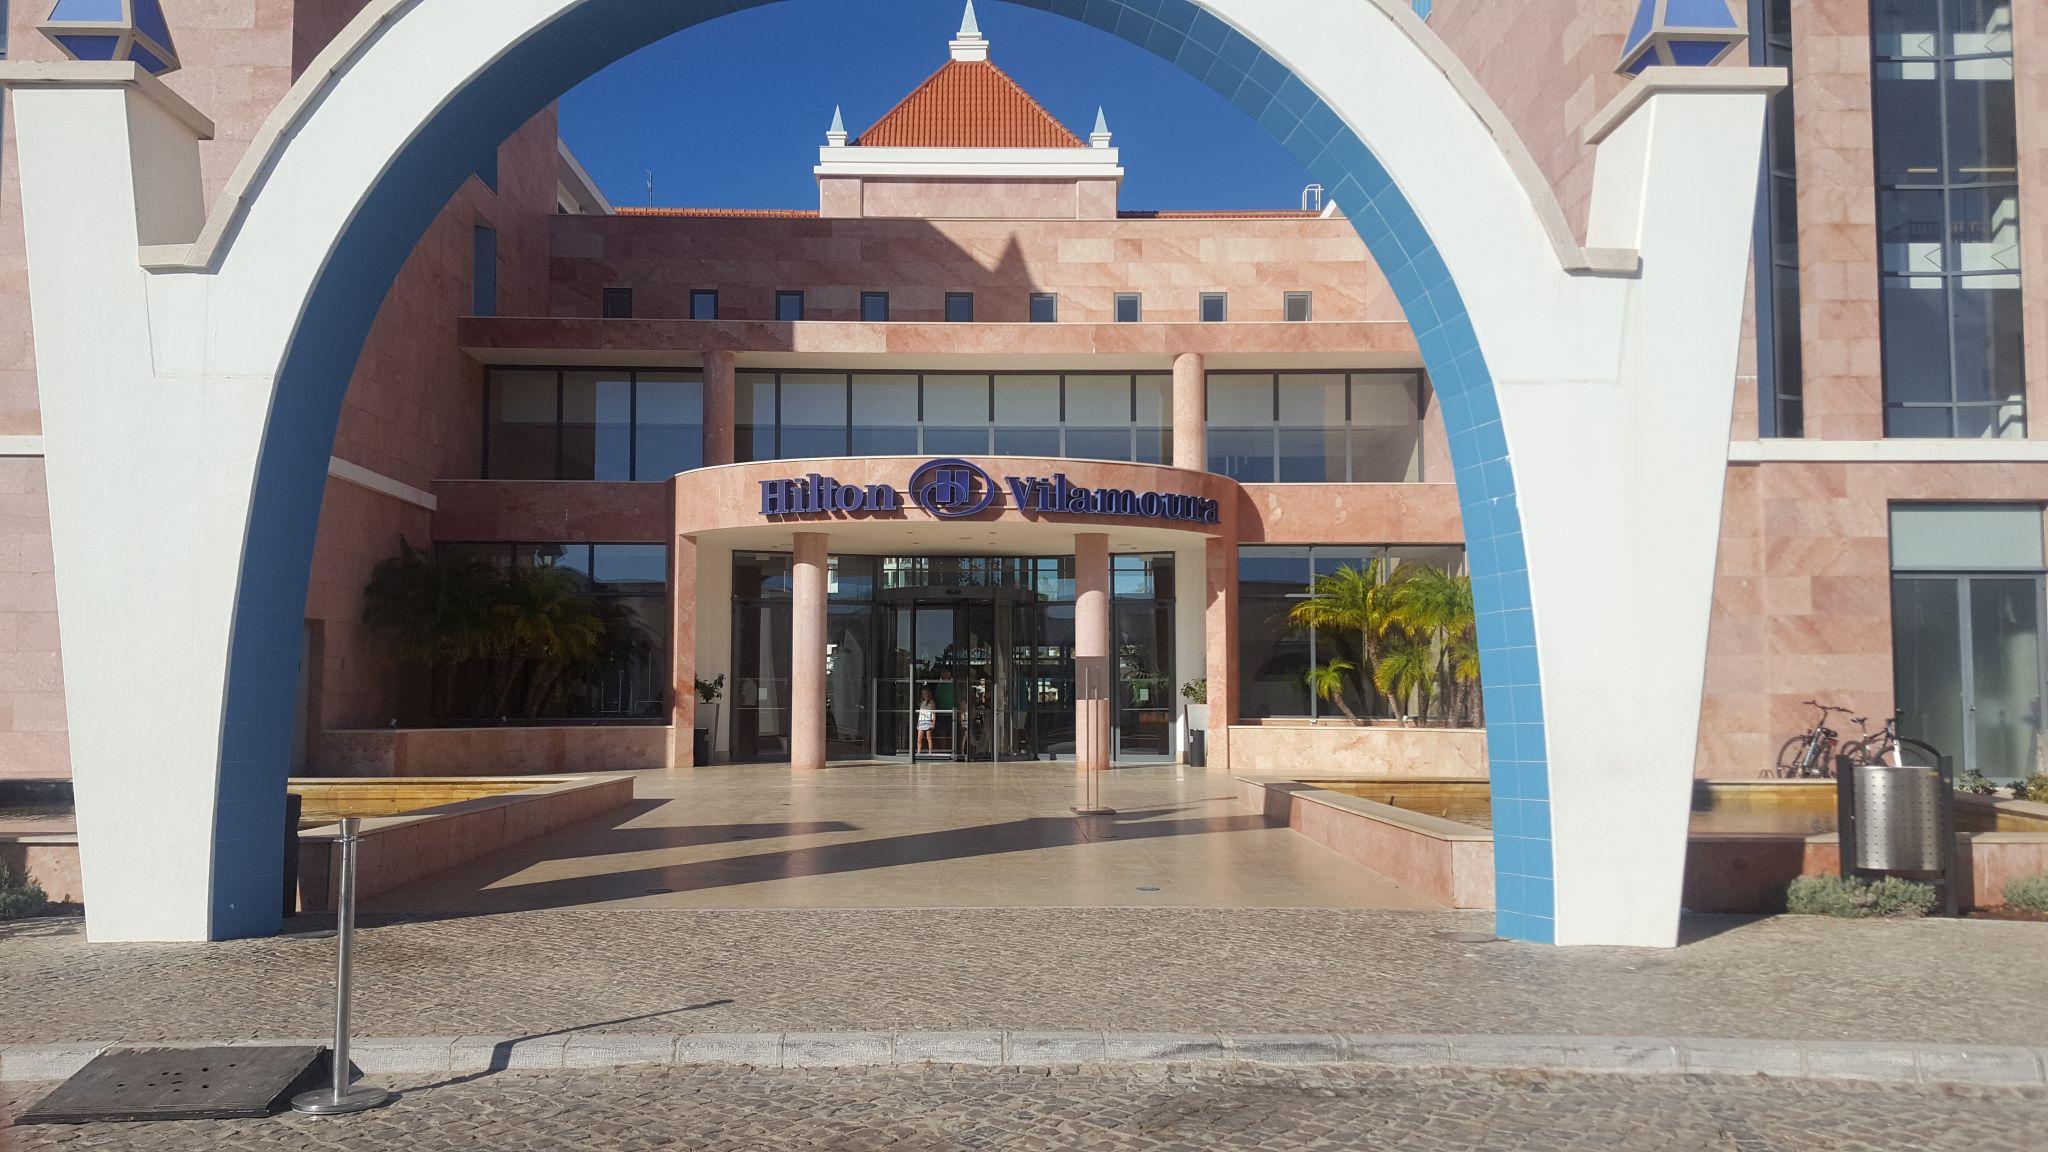 20170804 180924 1440x810 - My Travel Diaries: I Left My Heart In Vilamoura